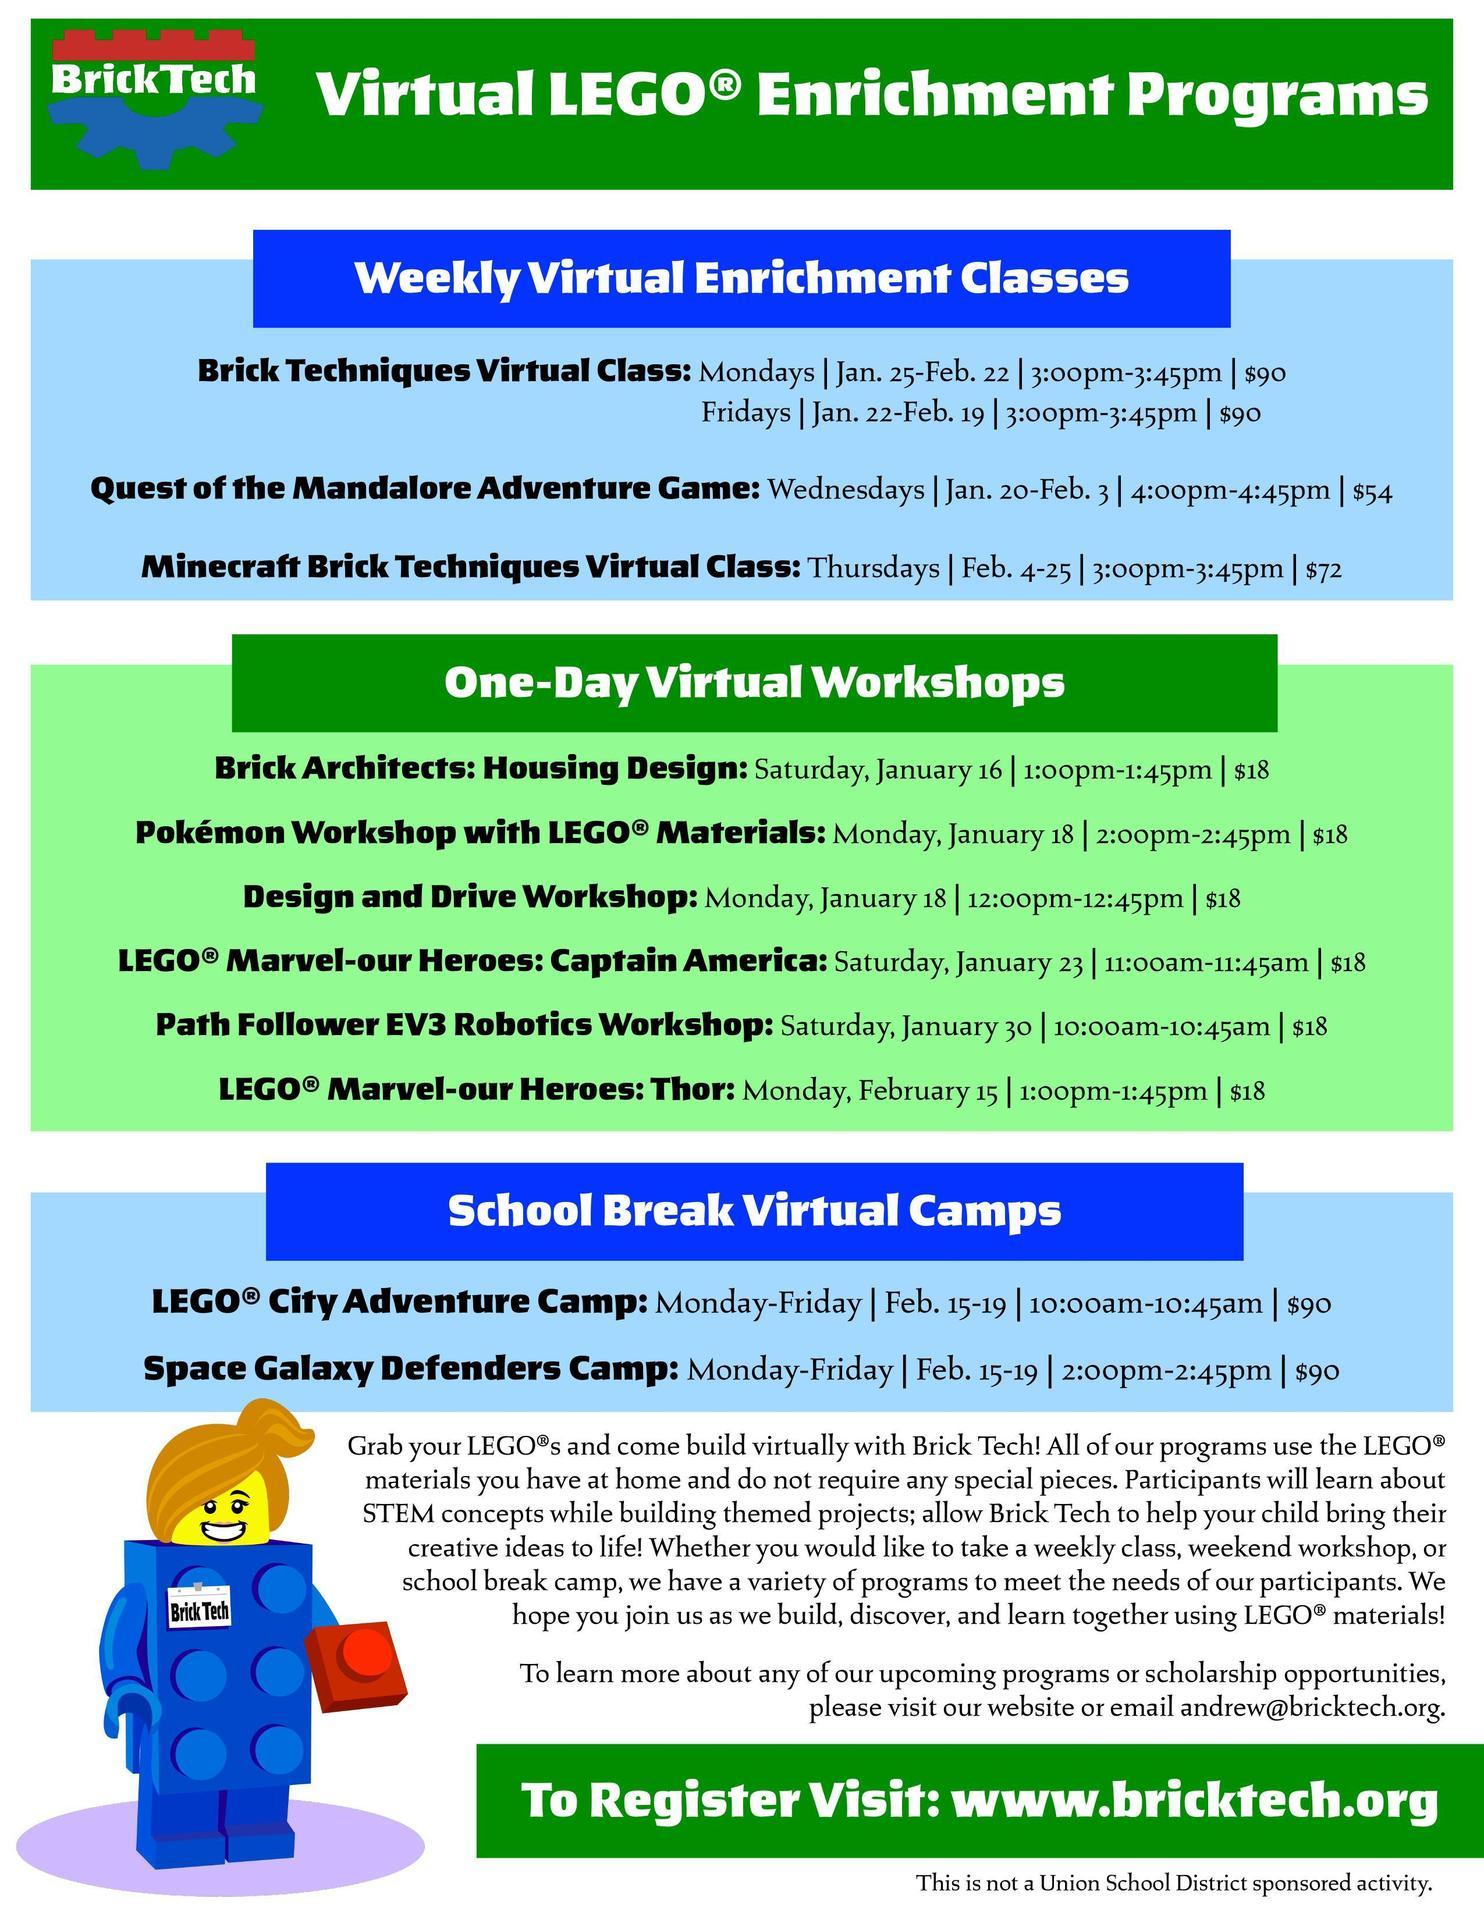 Virtual Lego Program